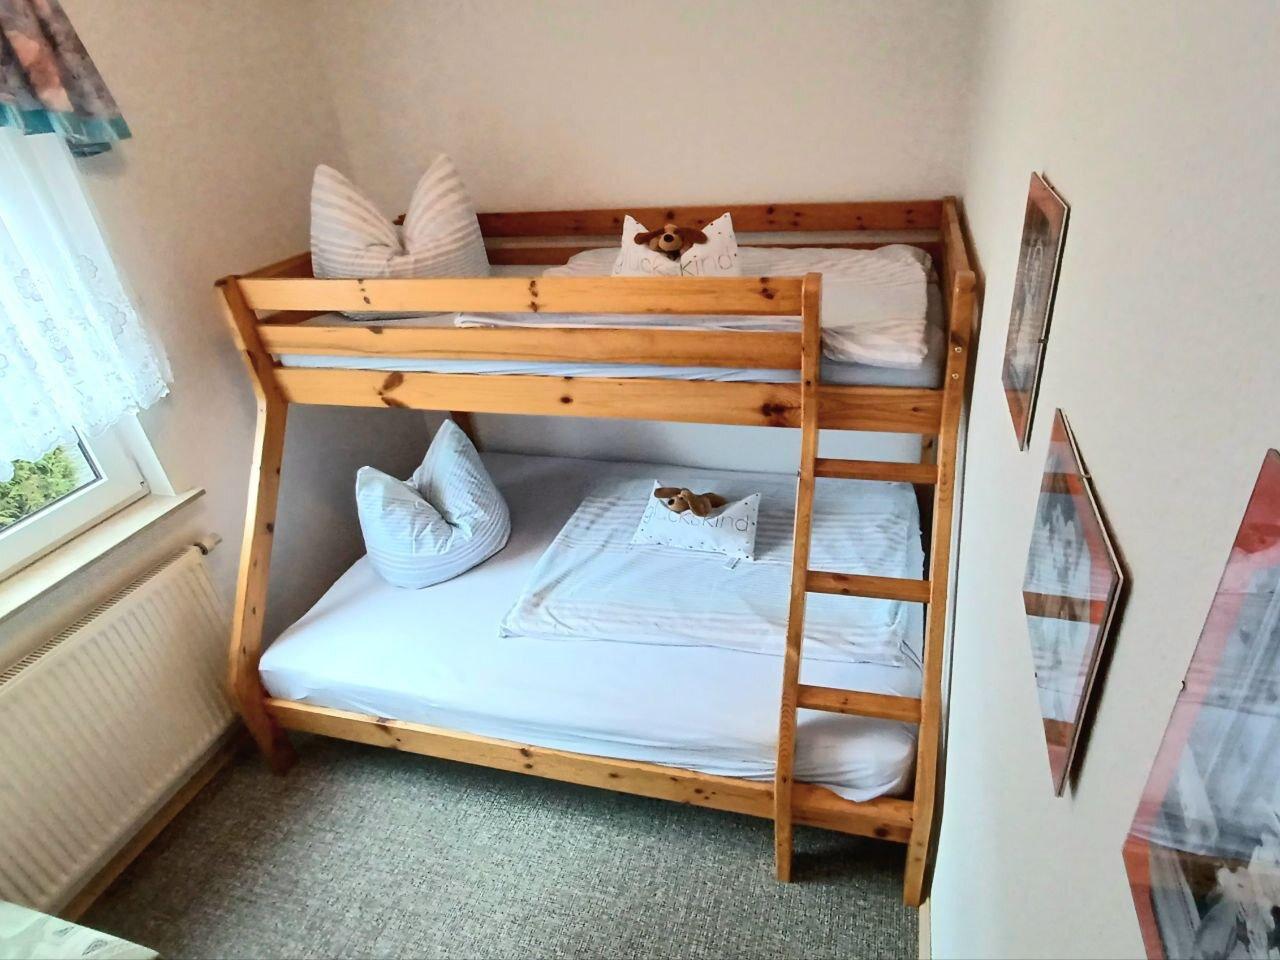 Kinderzimmer mit extra gro�em Bett